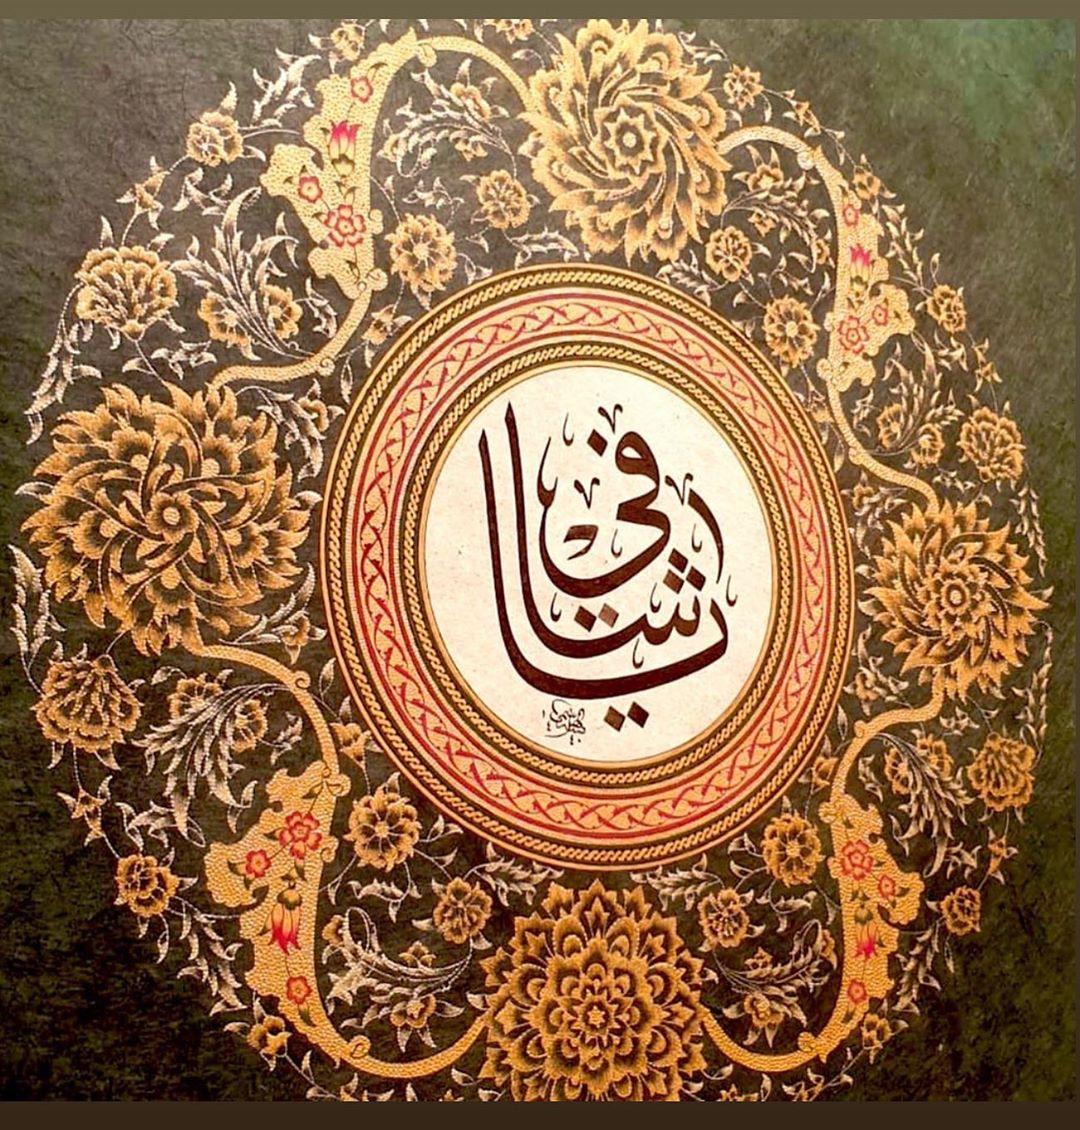 Khat Diwani Ajhalawani/Amr اللهم  اشف مرضى كورونا  وجميع المرضى  ياشافي… 1023